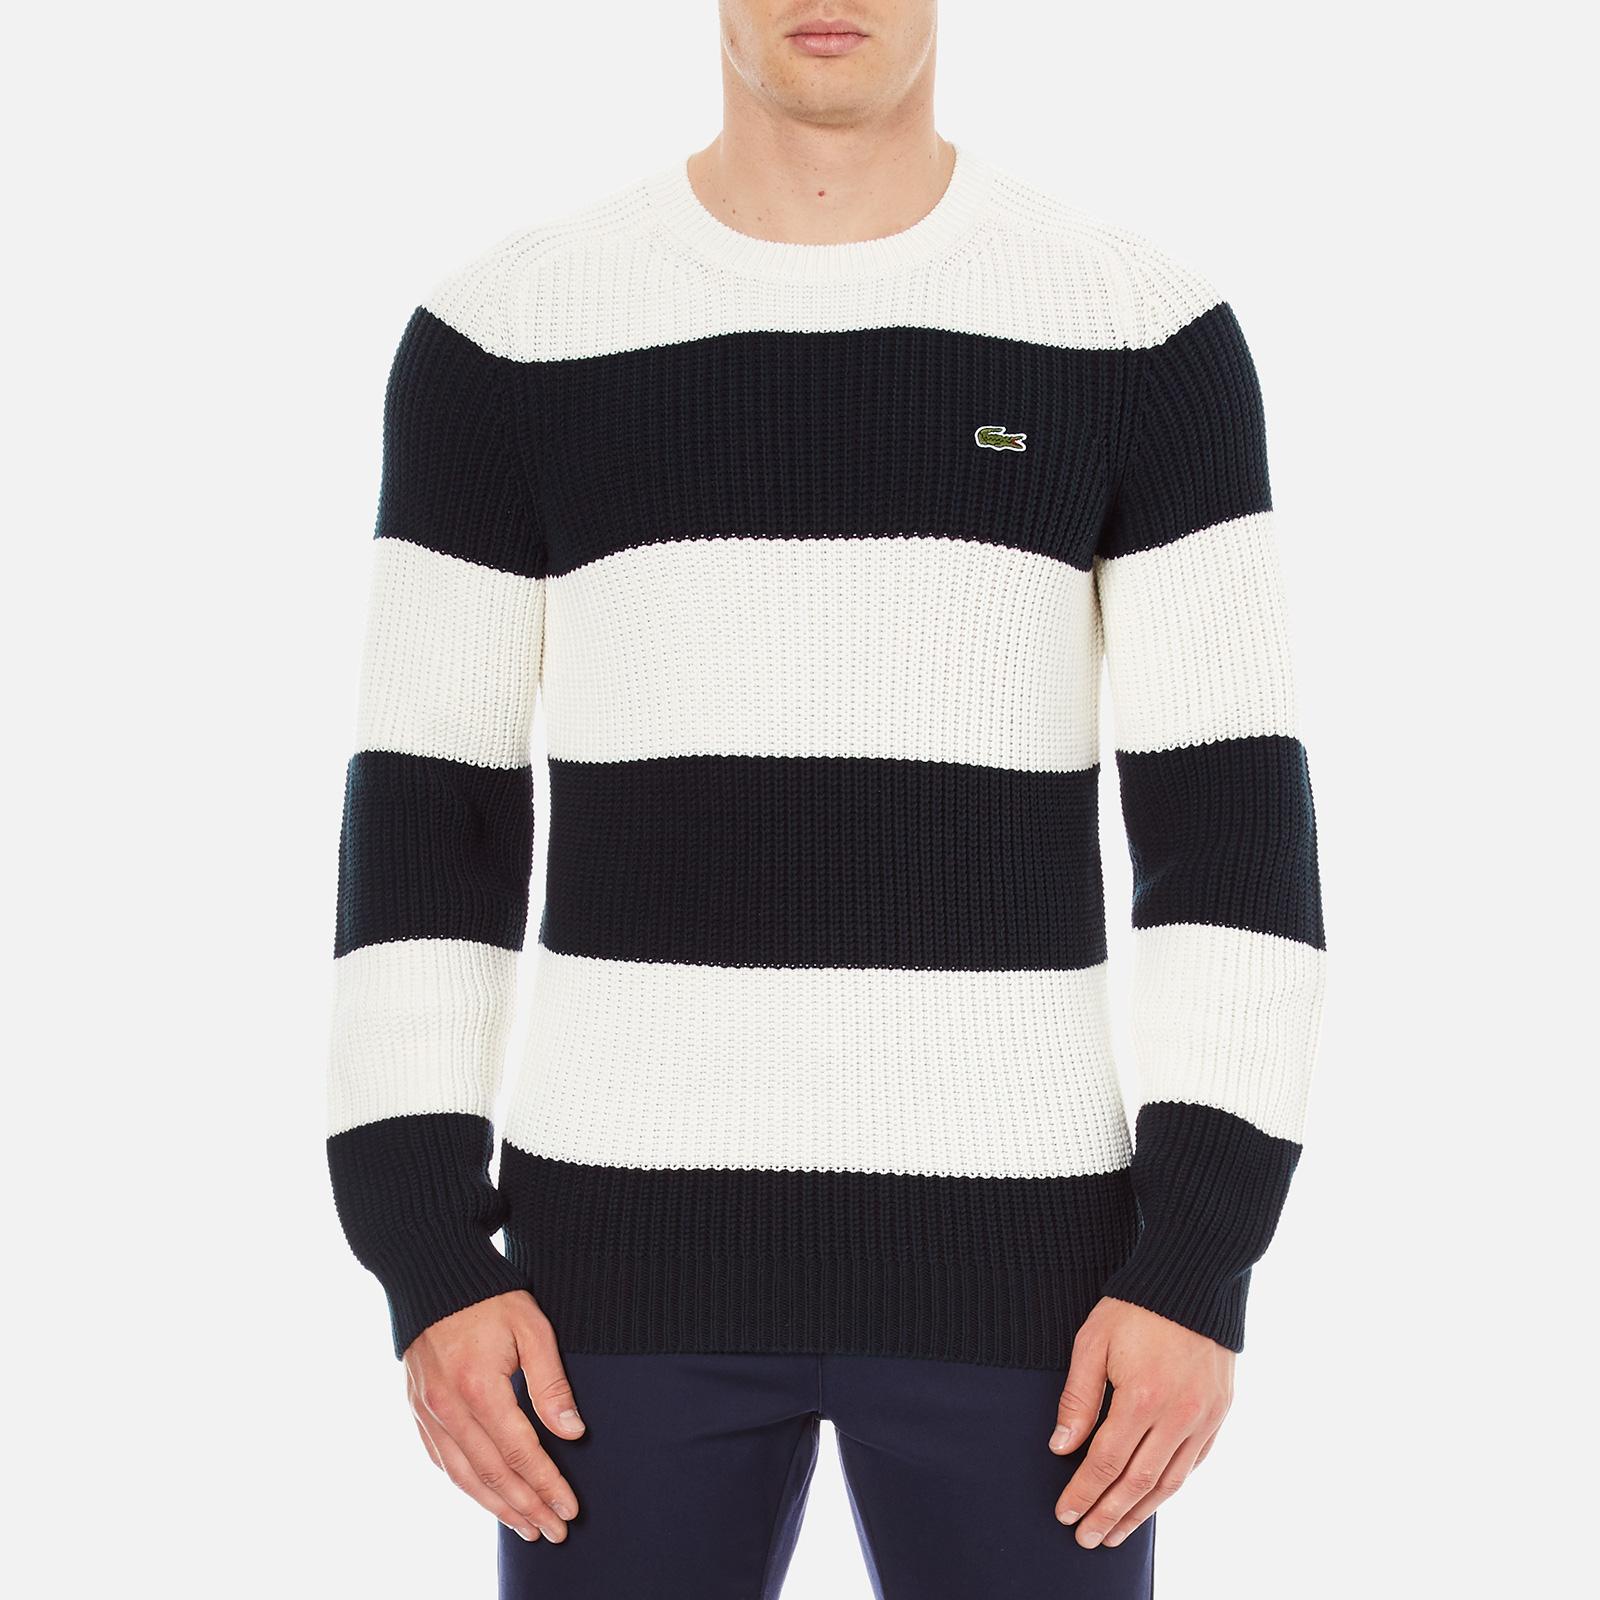 35672c72 Lacoste Men's Crew Neck Stripe Sweatshirt - Navy Blue/Flour